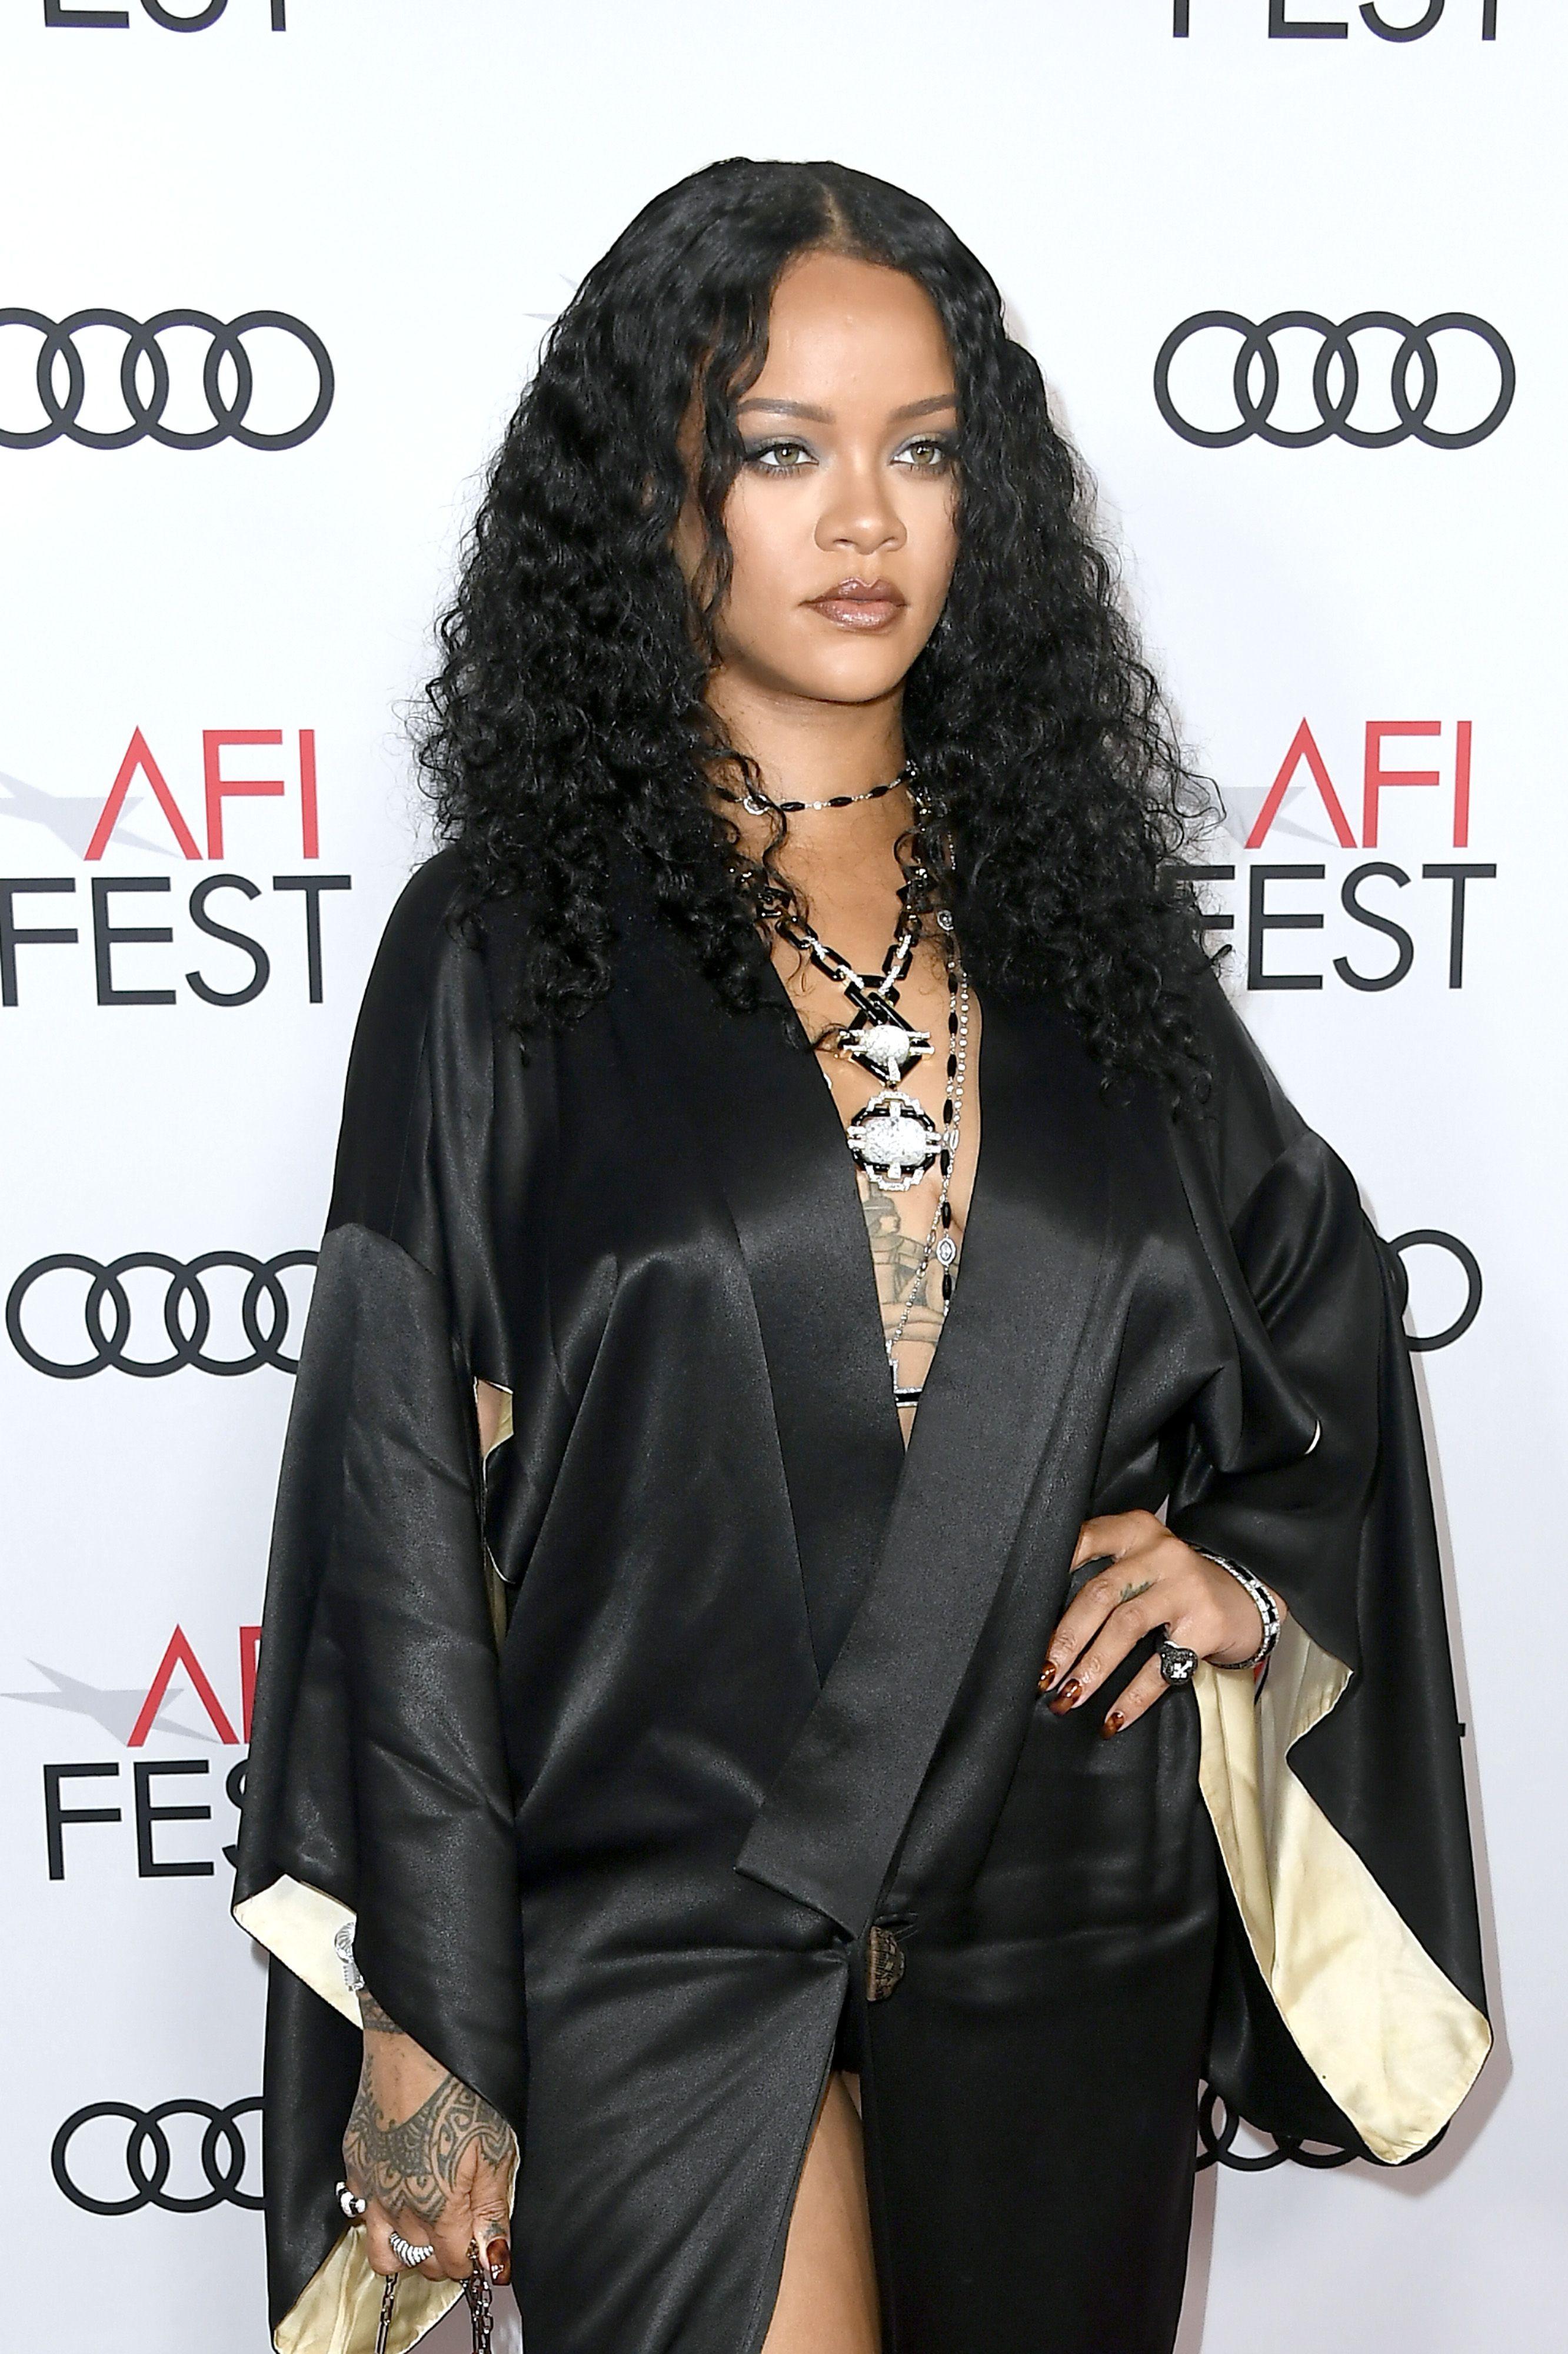 Rihanna models new Fenty sunglasses in tiny bikini and looks ah-mazing